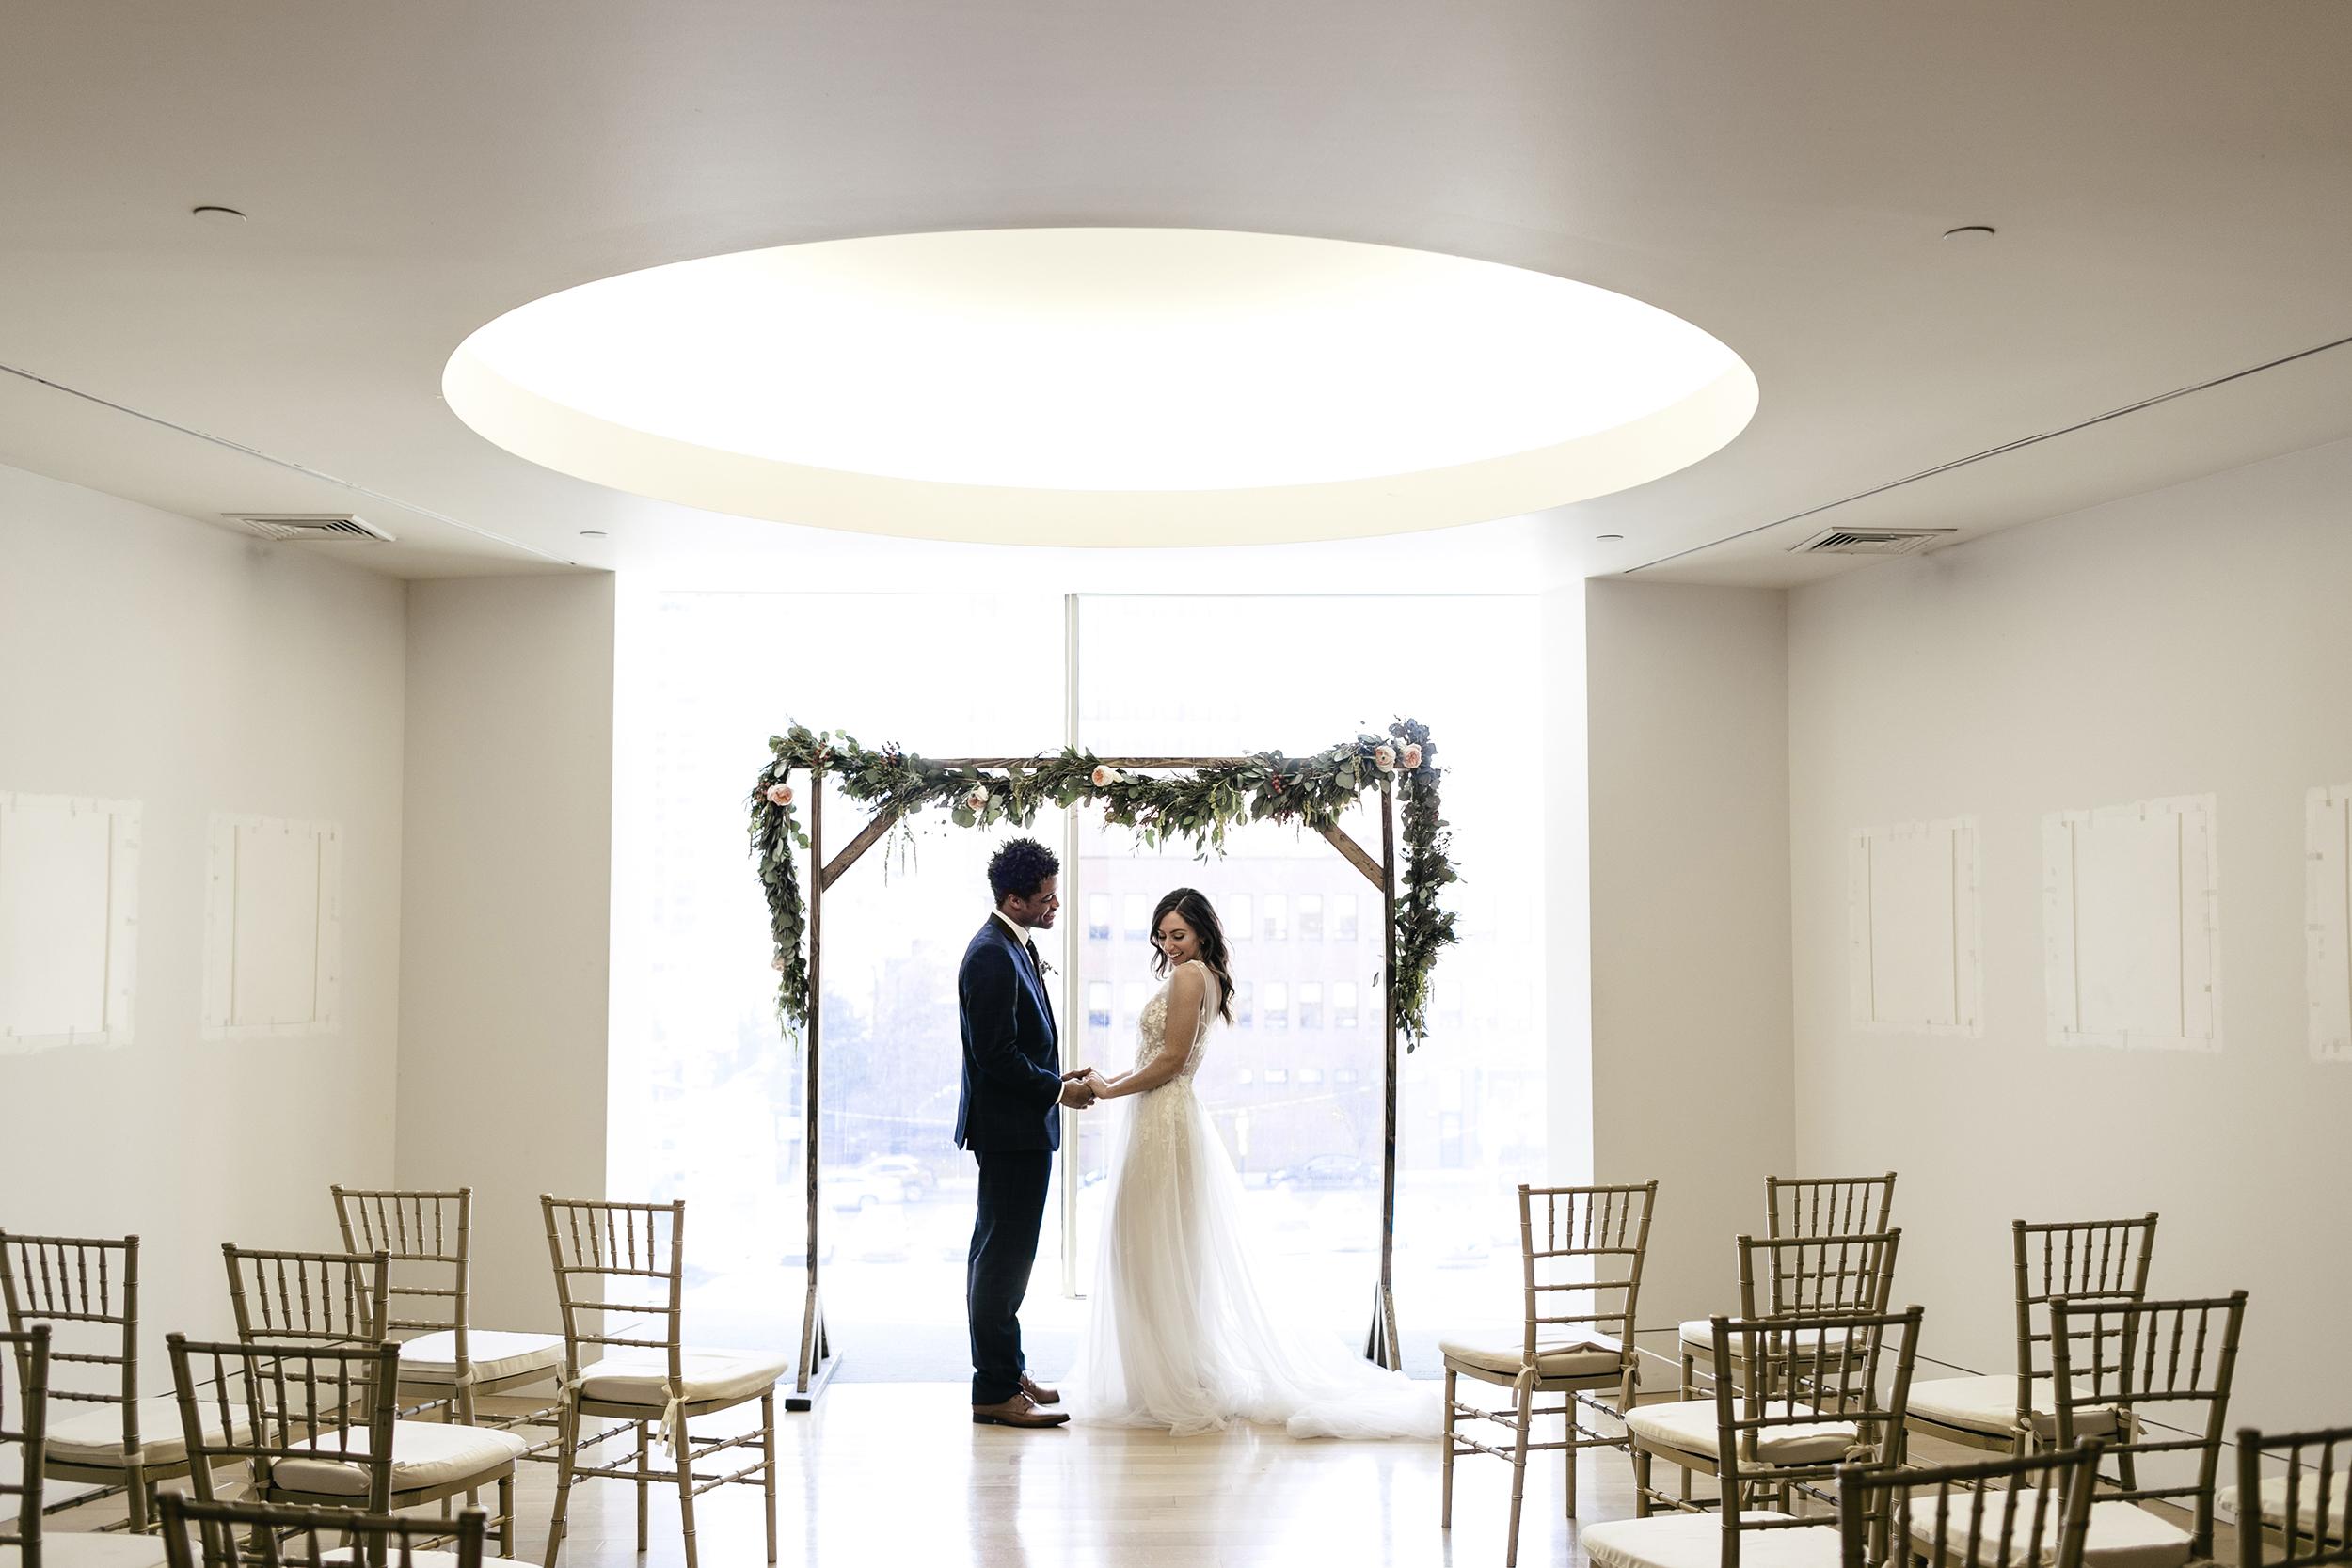 photography-wedding-weddings-natural-candid-pafa-pennsylvania academy-philadephia-philly-philadelphia wedding-mixed race-editorial-modern-fine-art-034.JPG